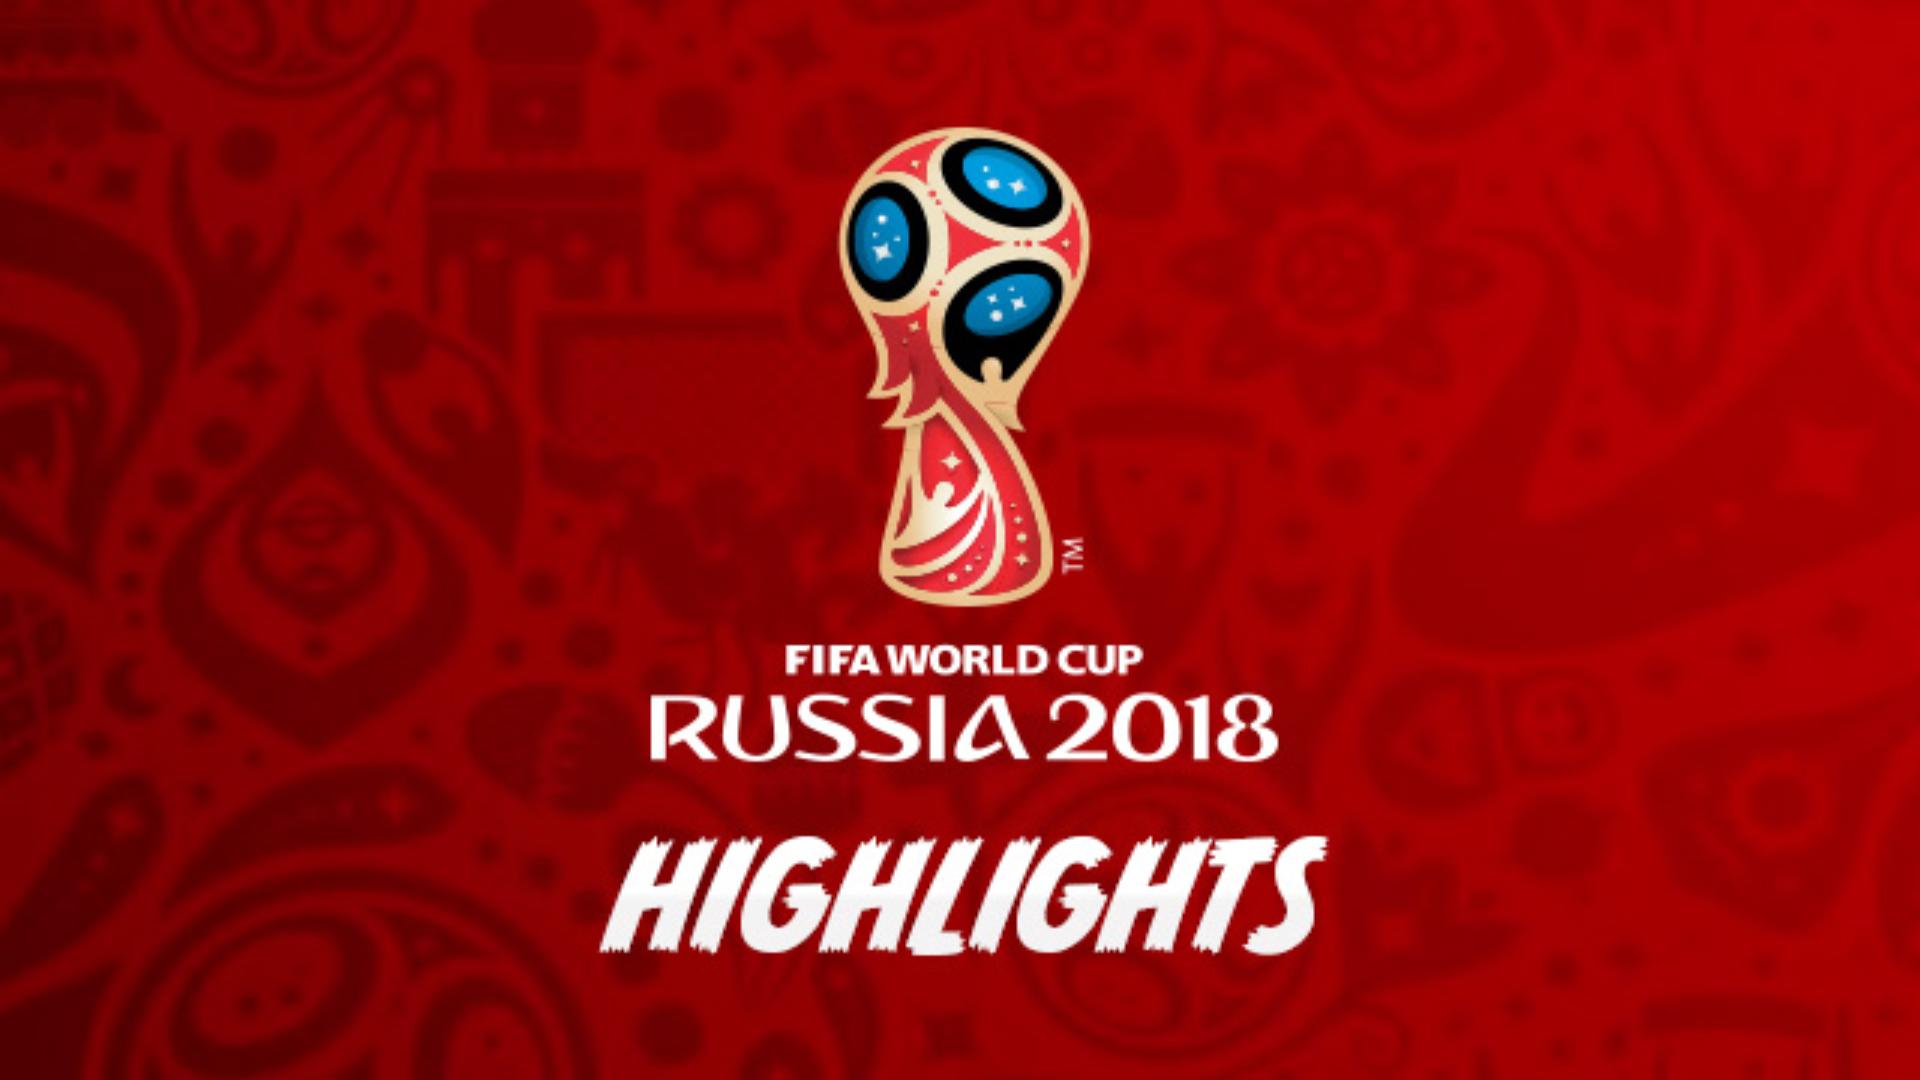 2018 FIFA WC MATCH HIGHLIGHTS